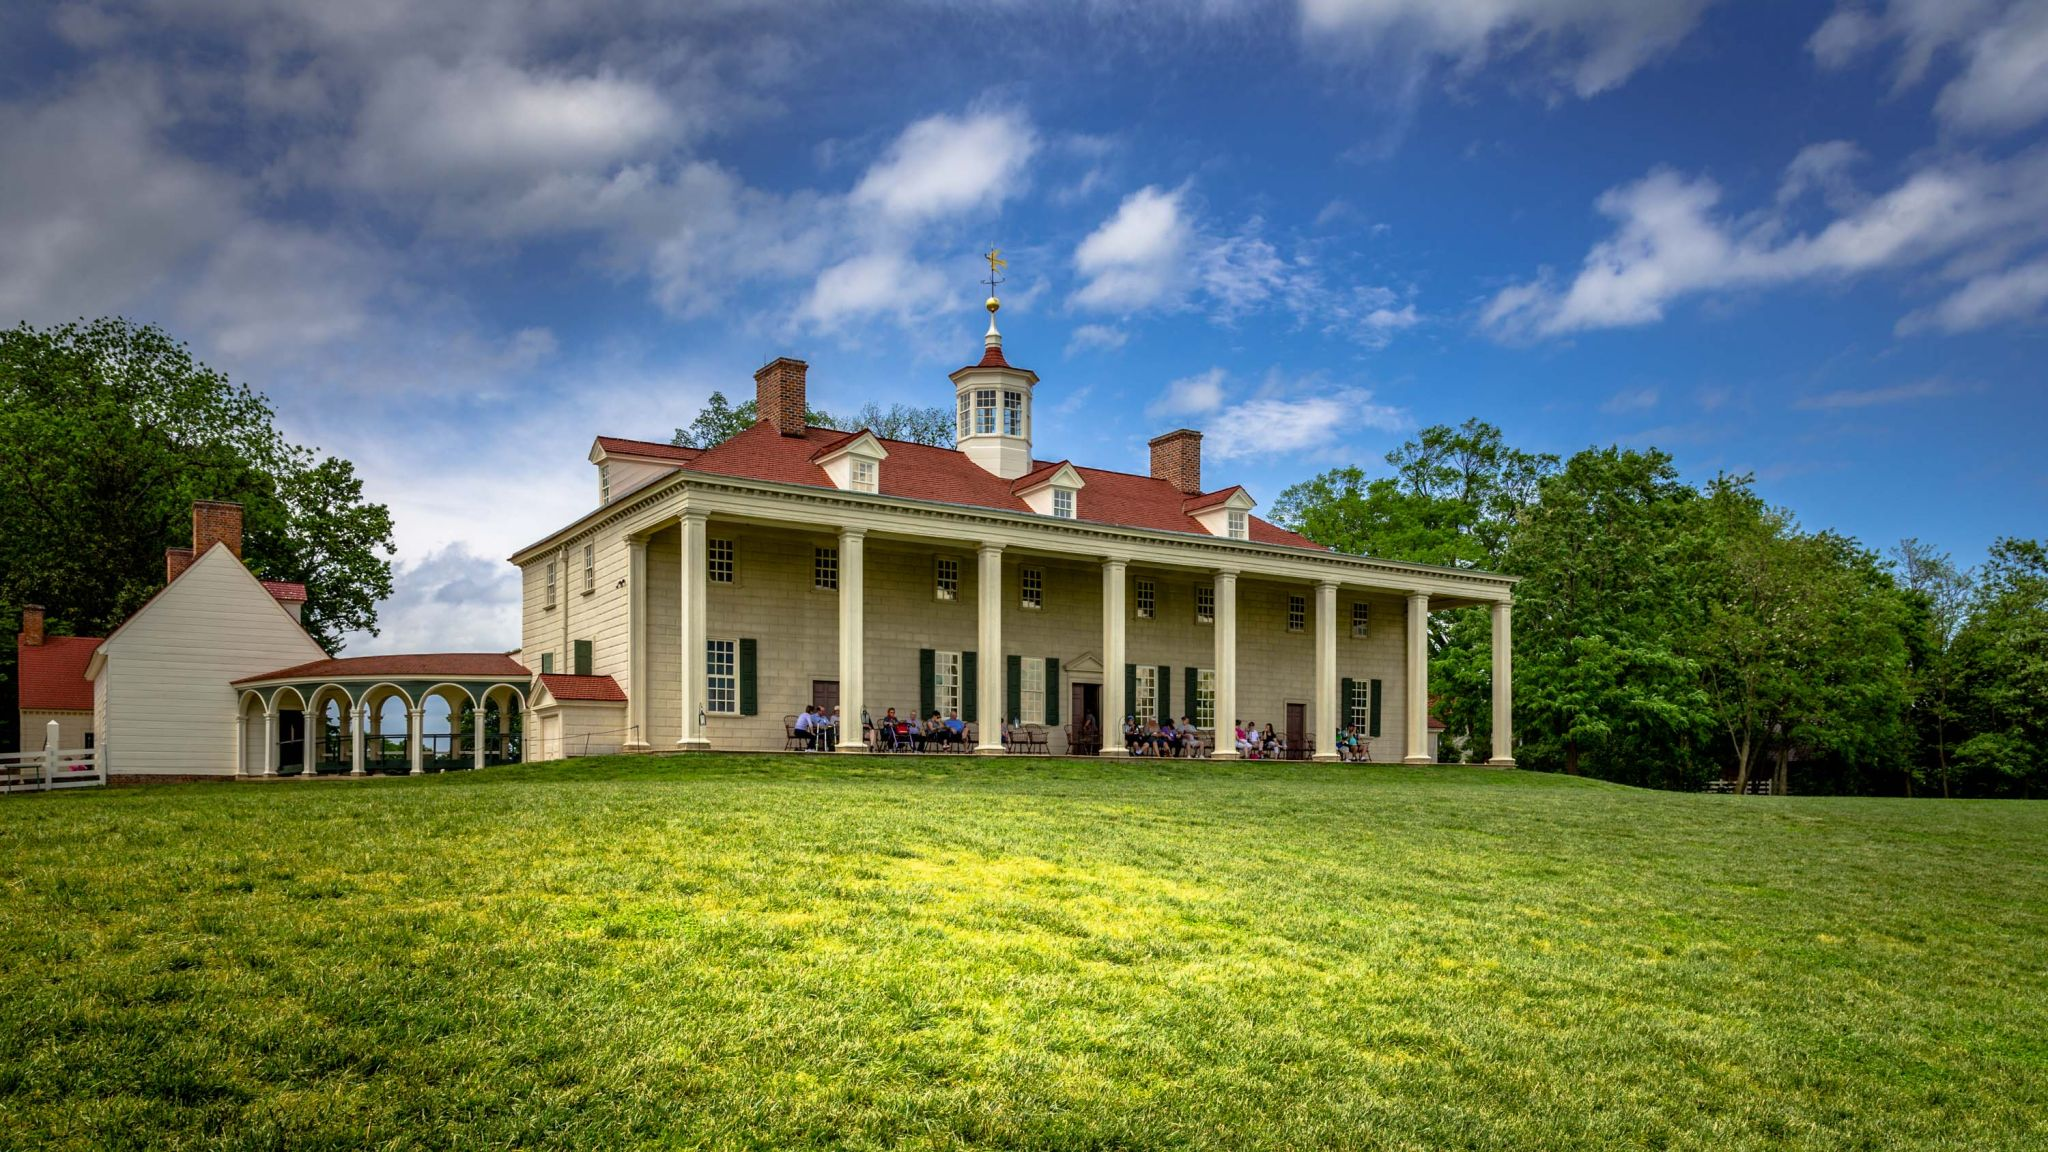 George Washington's Mount Vernon, USA